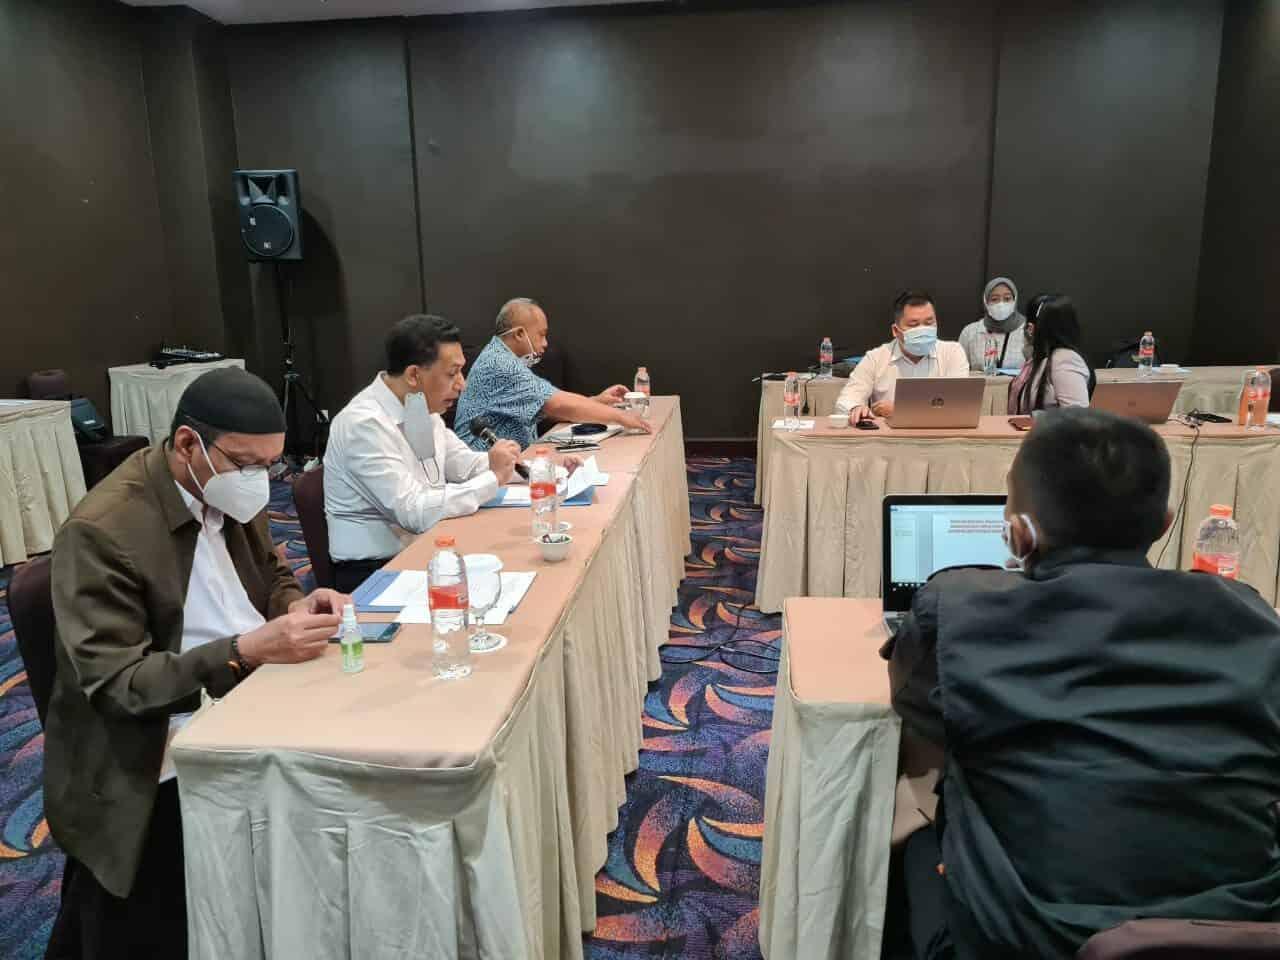 Kemenko Marves Terus Dorong Tindak Lanjut Penyusunan SOP Pertukaran Data dan Informasi sebagai Panduan Bersama Dalam Rangka Penegakan Hukum di Laut